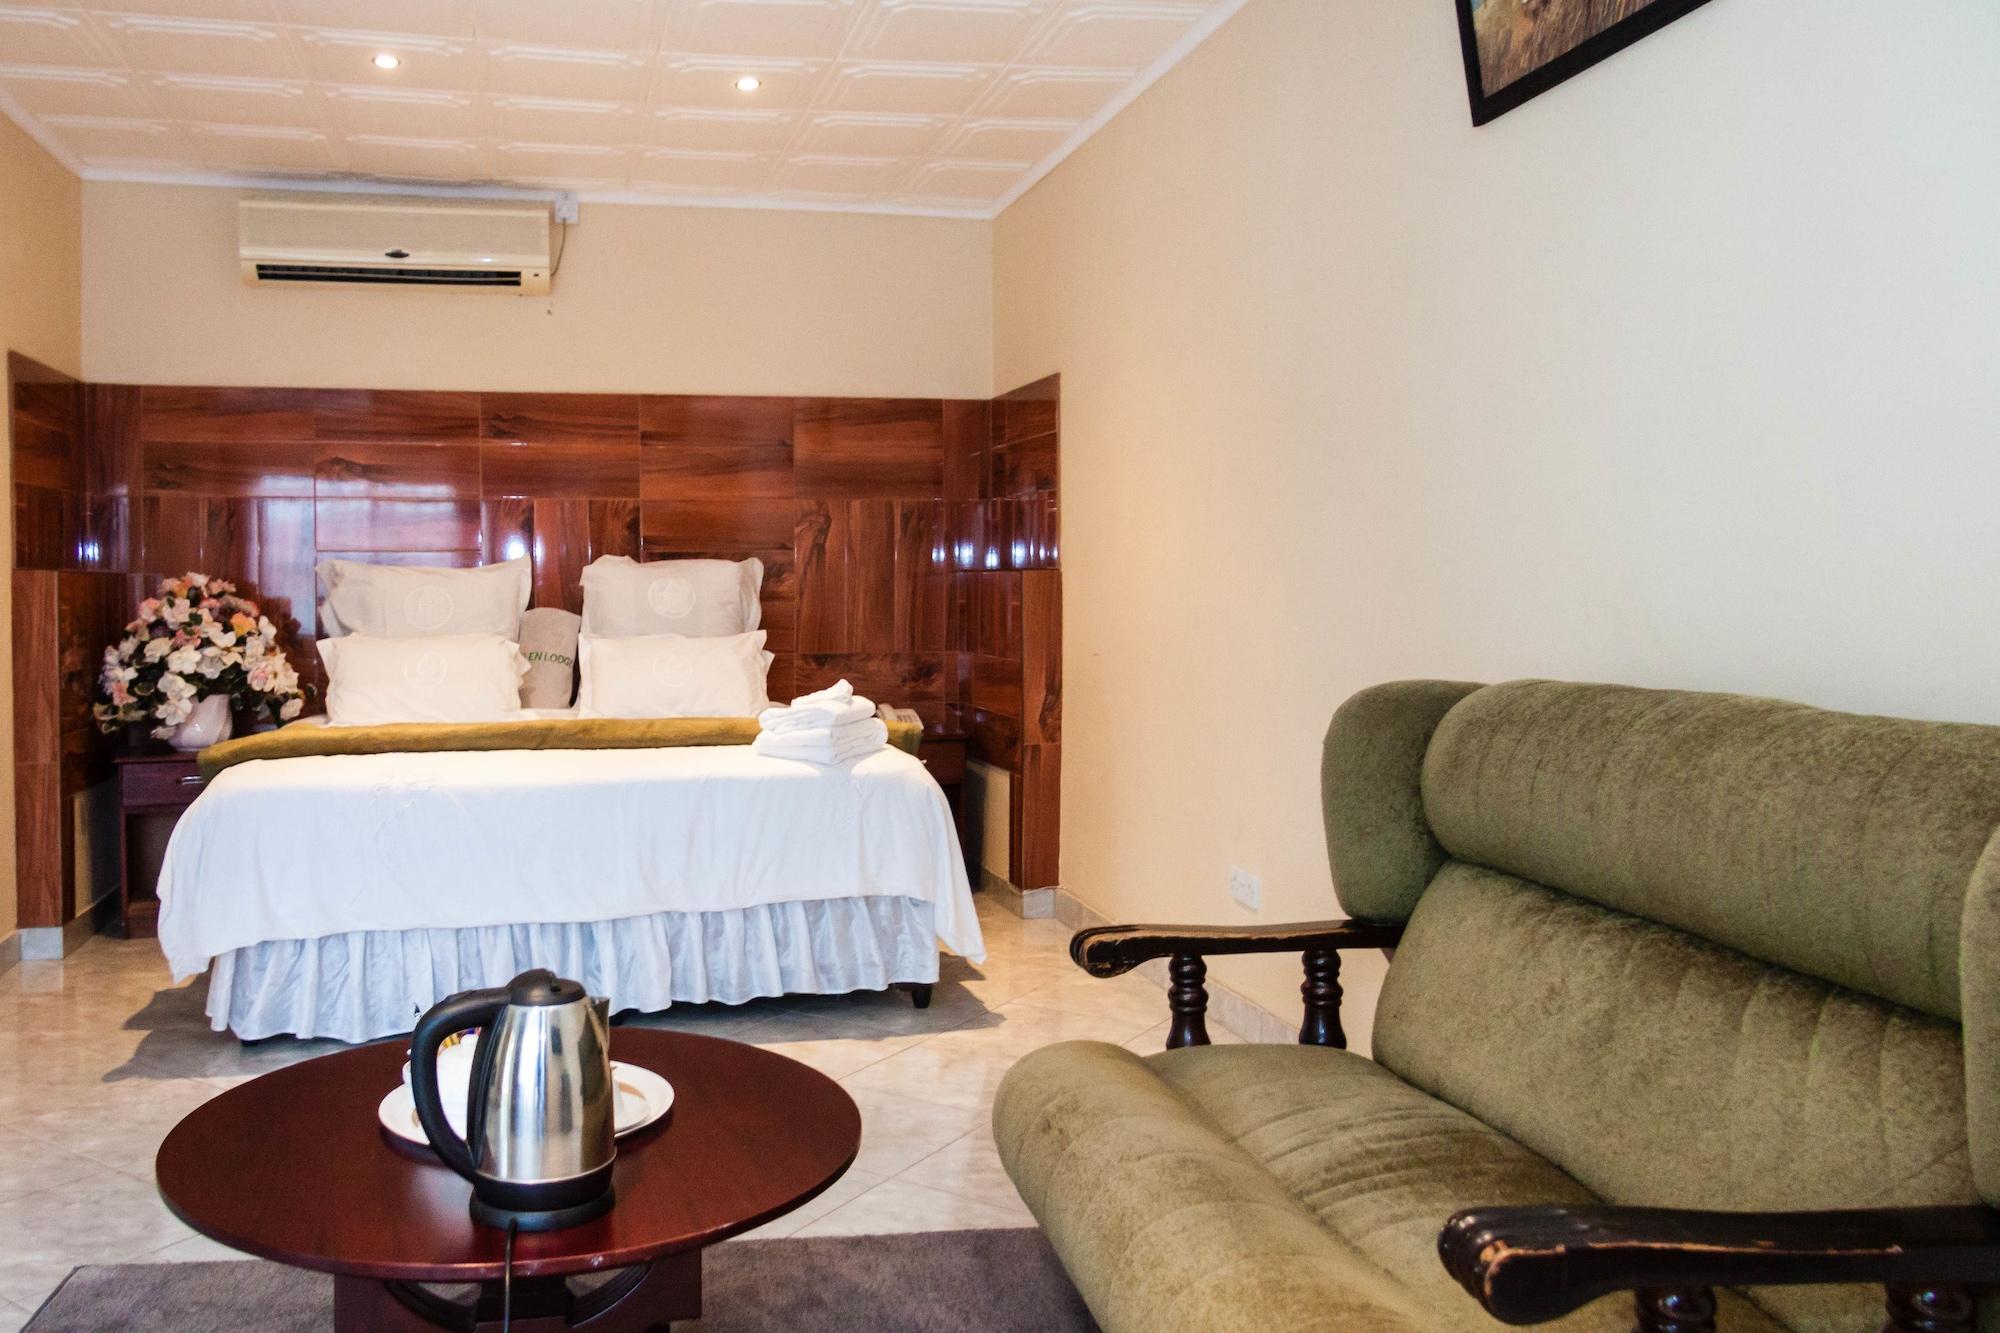 Glen Lodge & Tours, Matobo